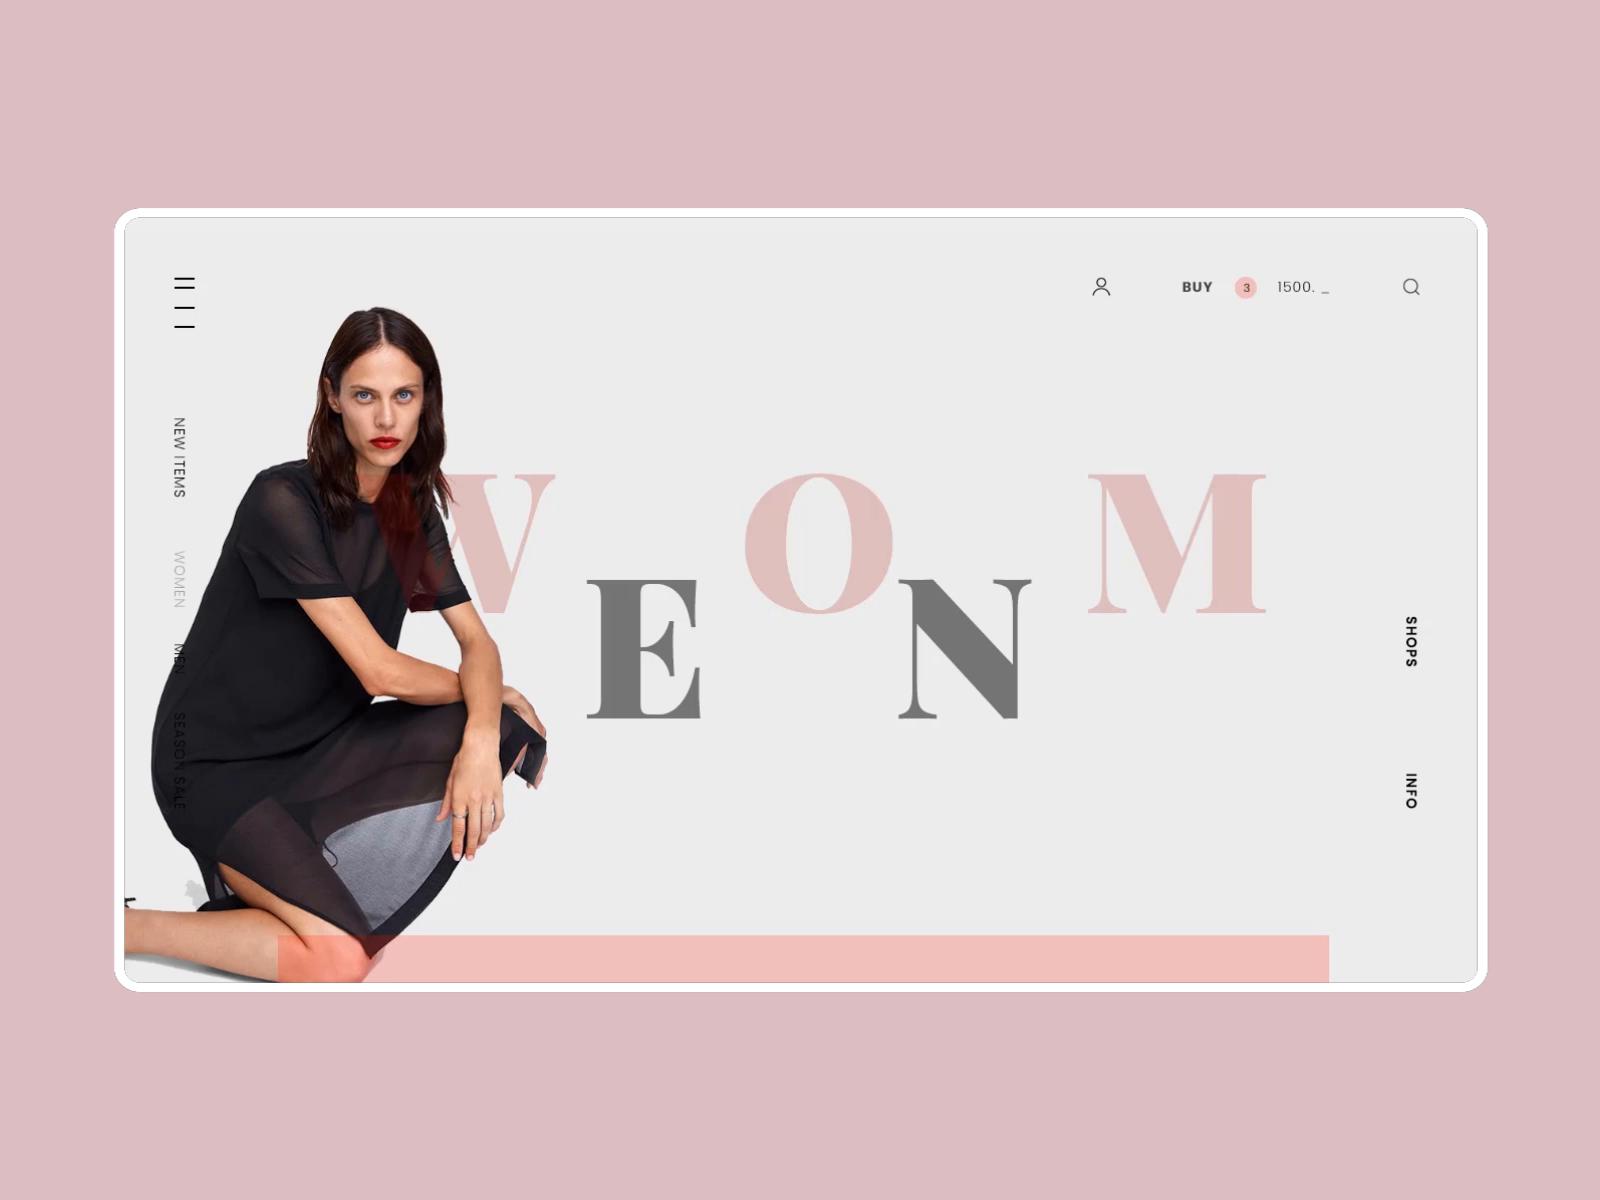 Zara catalog page